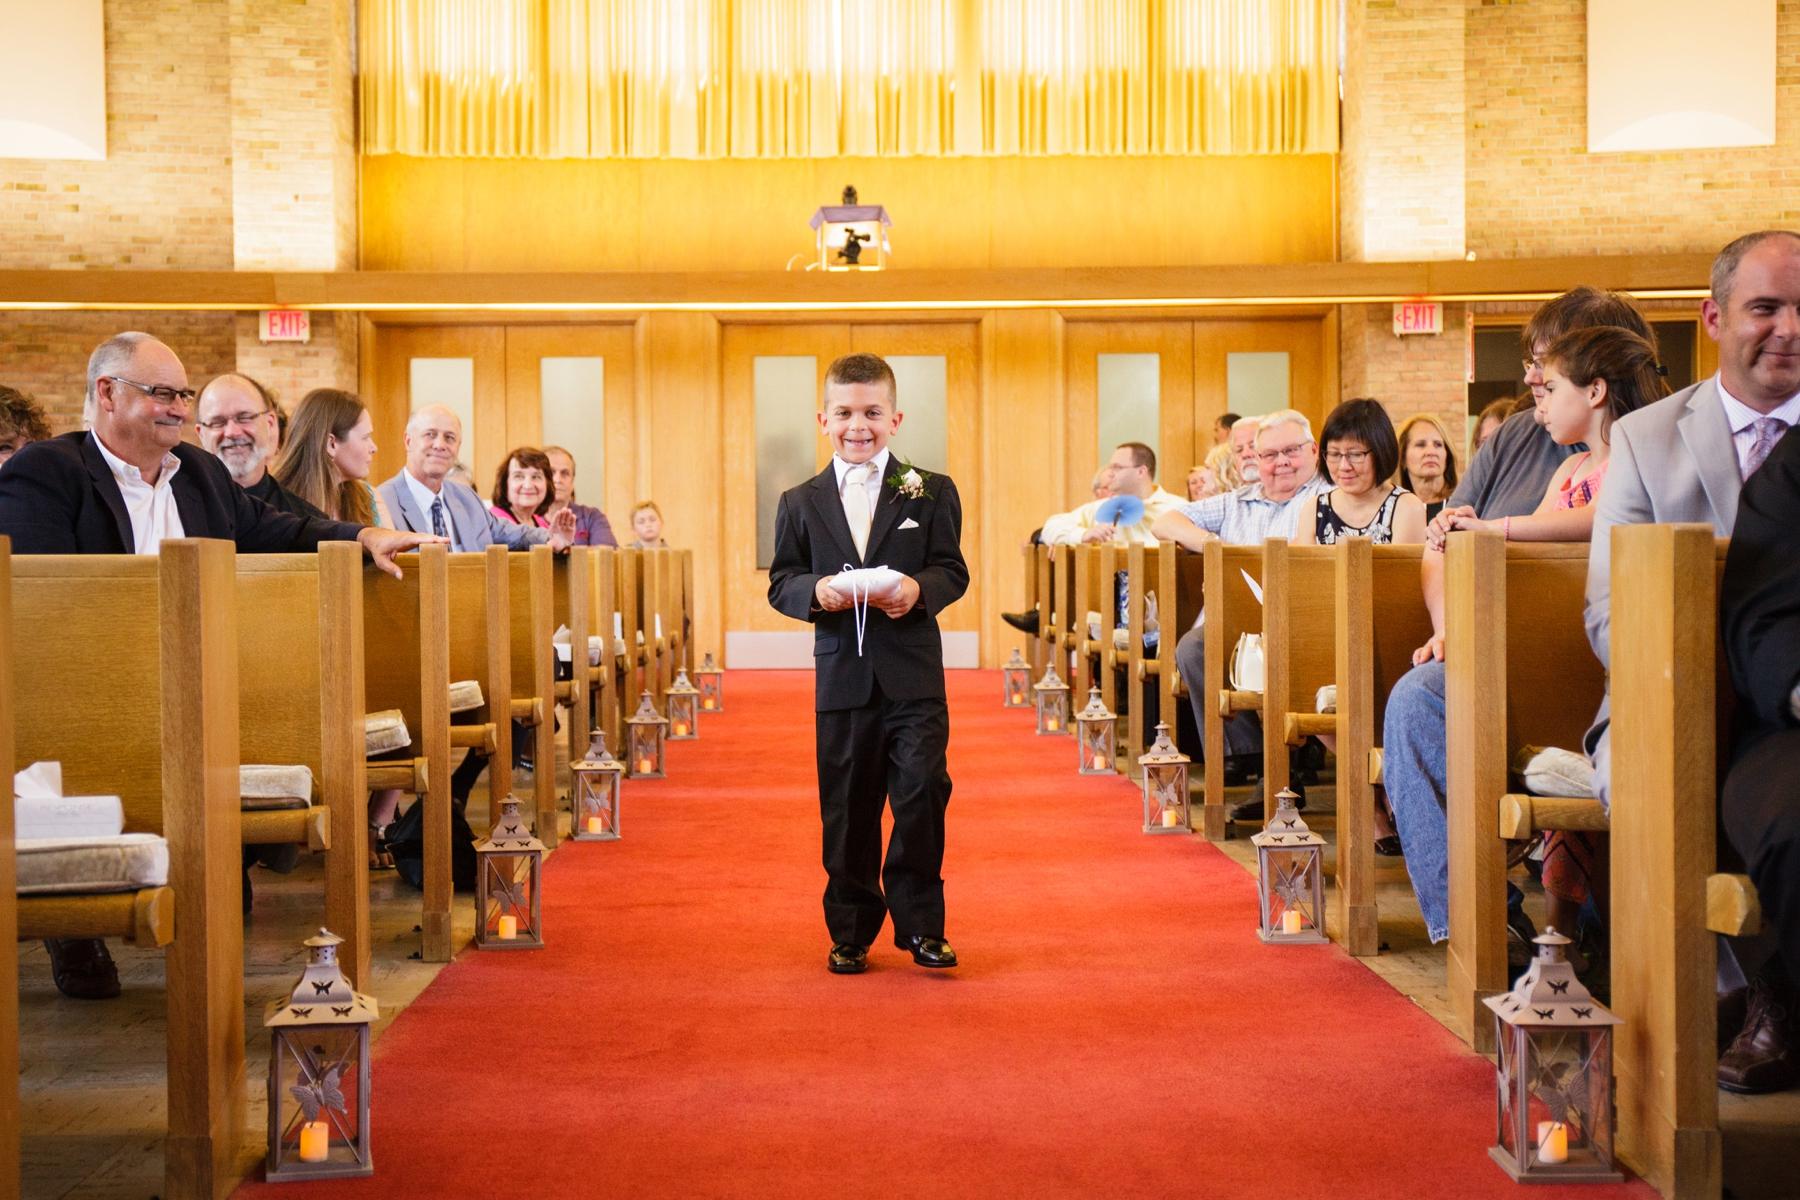 Ben_Jillian_Midland_Baycity_Wedding_0035.jpg